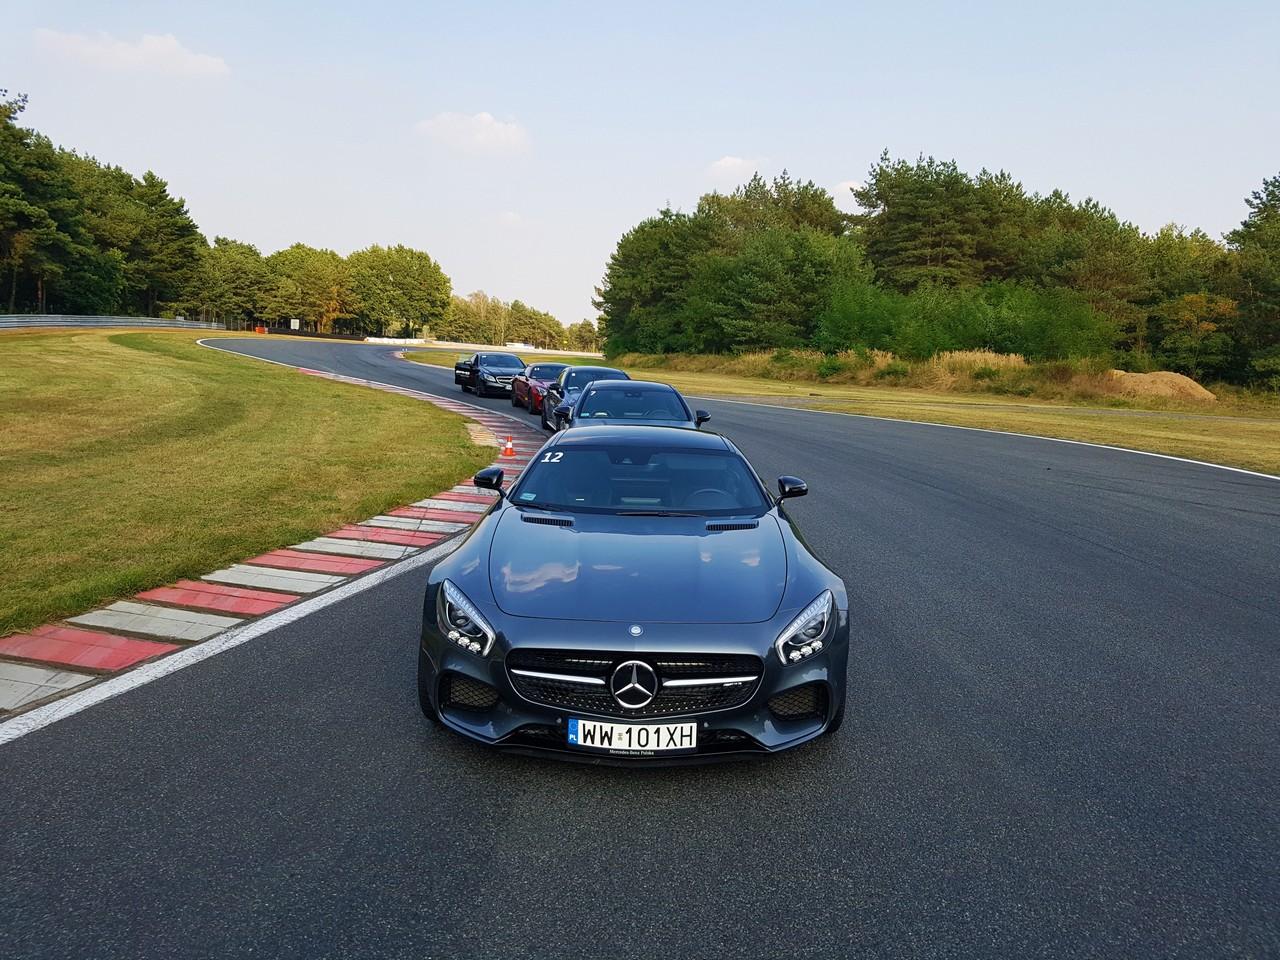 Mercedes AMG GT s - foto T. Kamiński